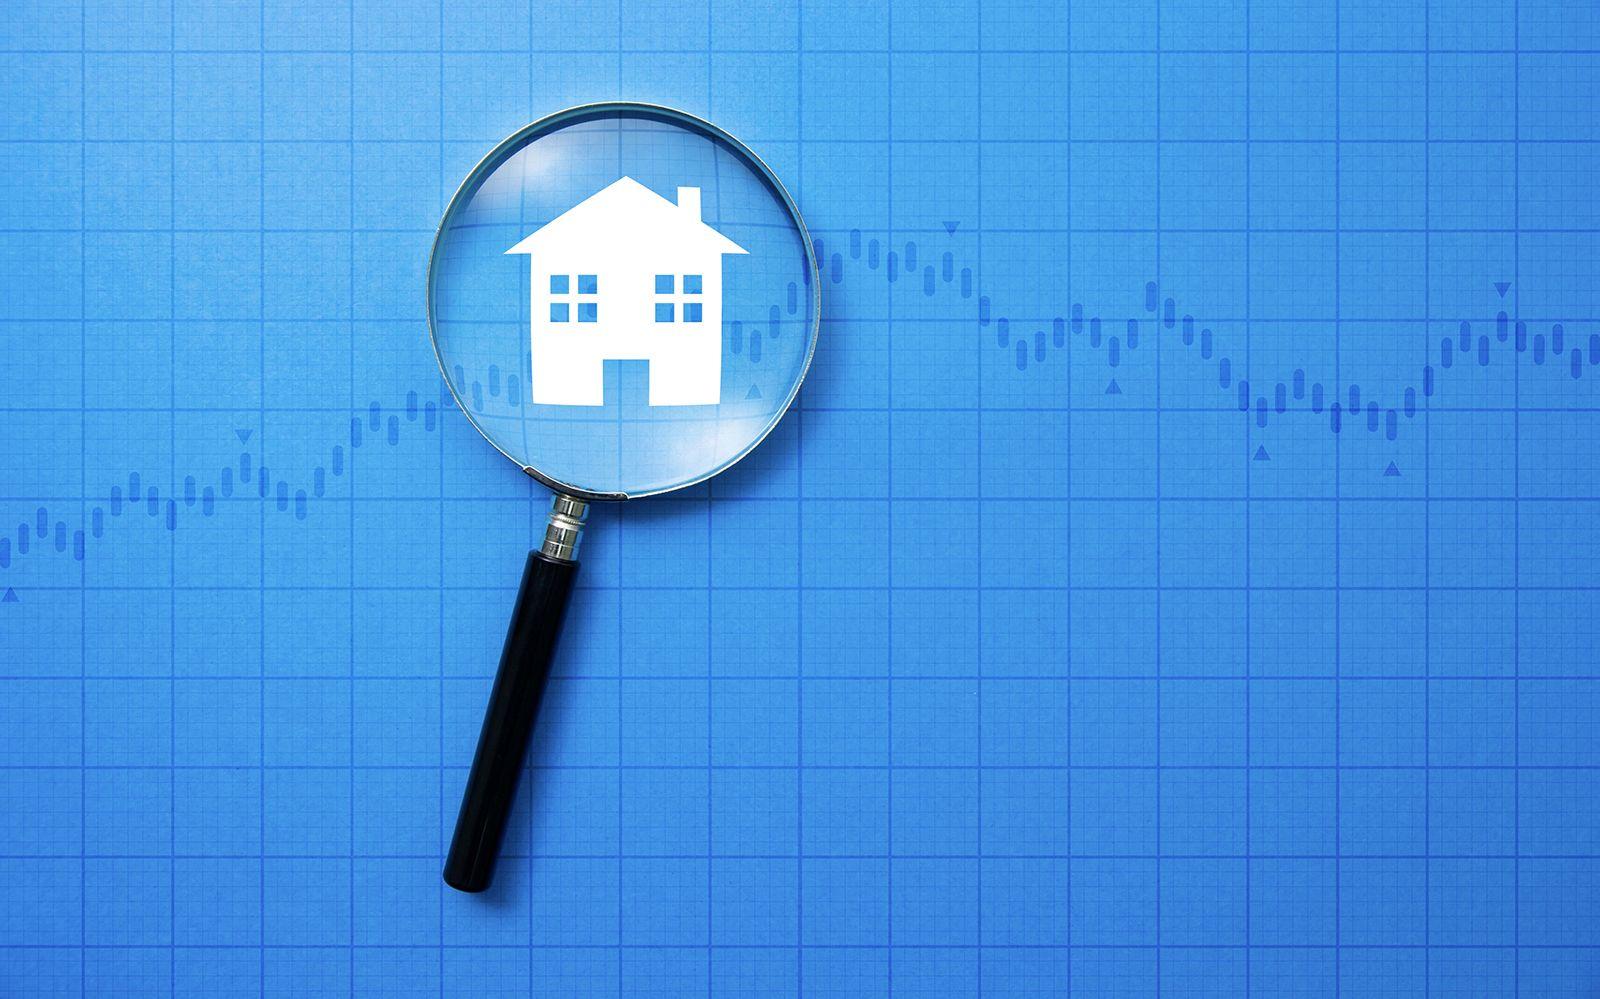 Homebuilding's '20 Scorecard Shows Heat In These Hotspots